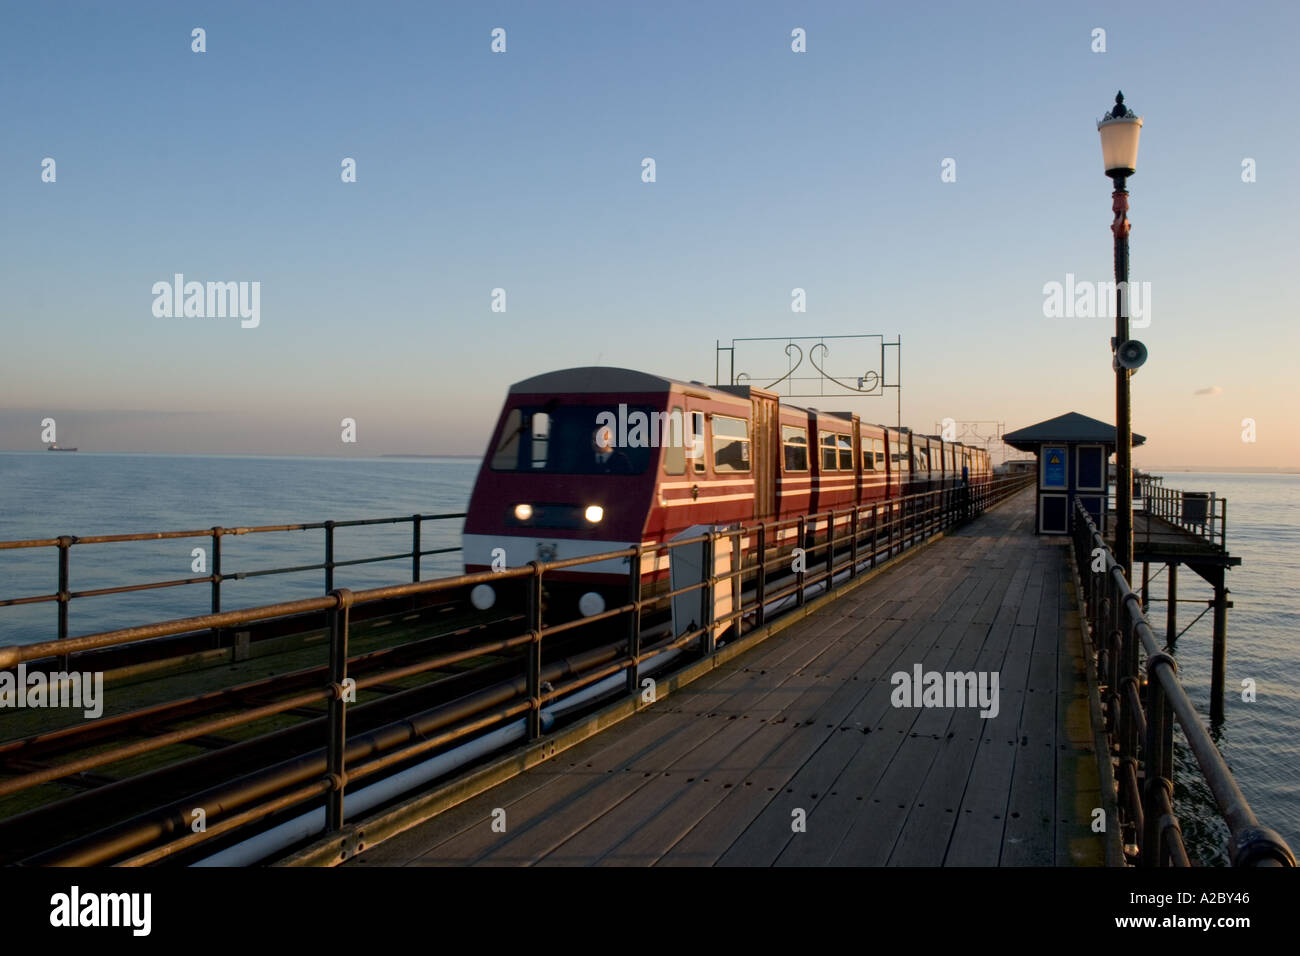 Railway on southend pier Southend on sea Essex - Stock Image